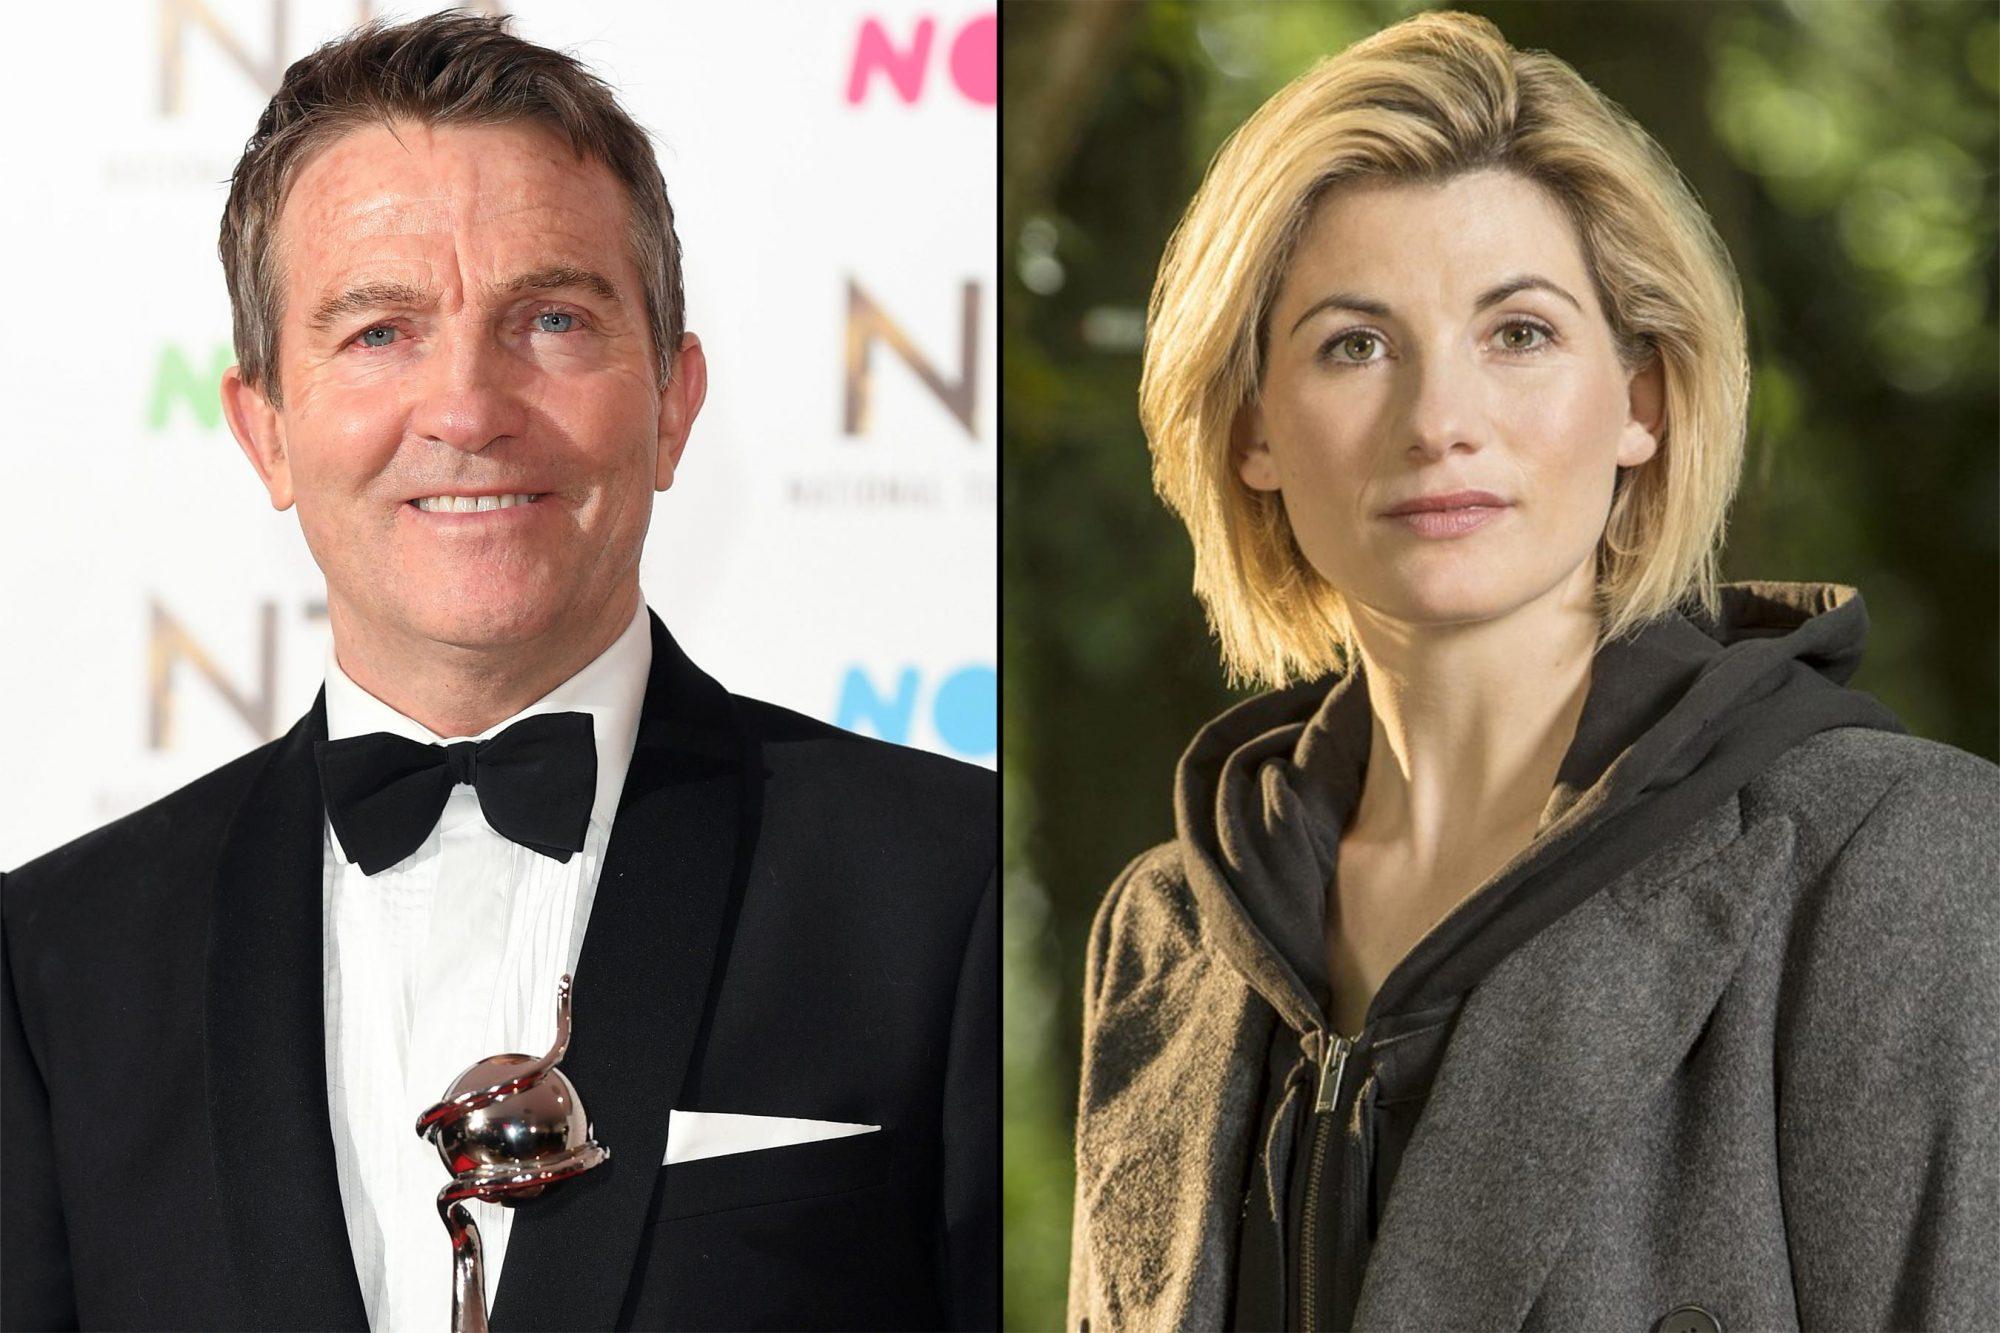 Jodie-Whittaker-Bradley-Walsh